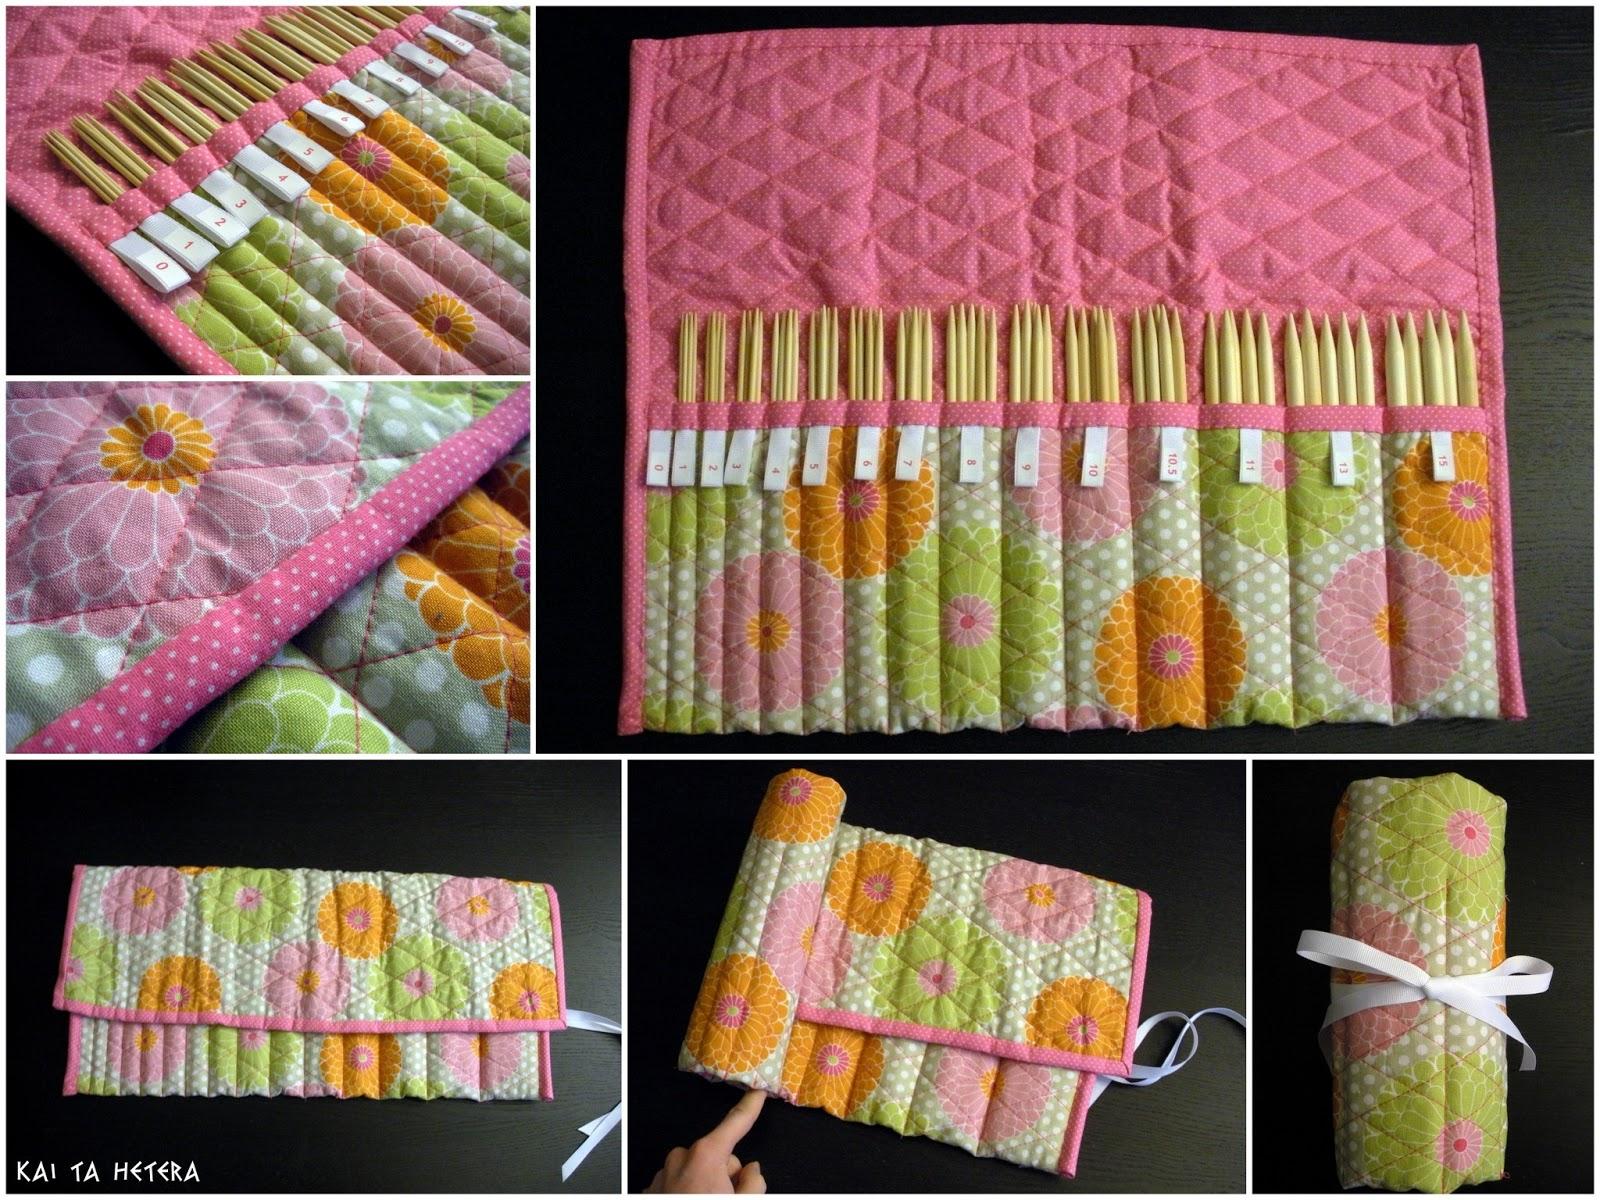 Quilted Knitting Needle Case Pattern : Kai ta hetera quilted knitting needle case